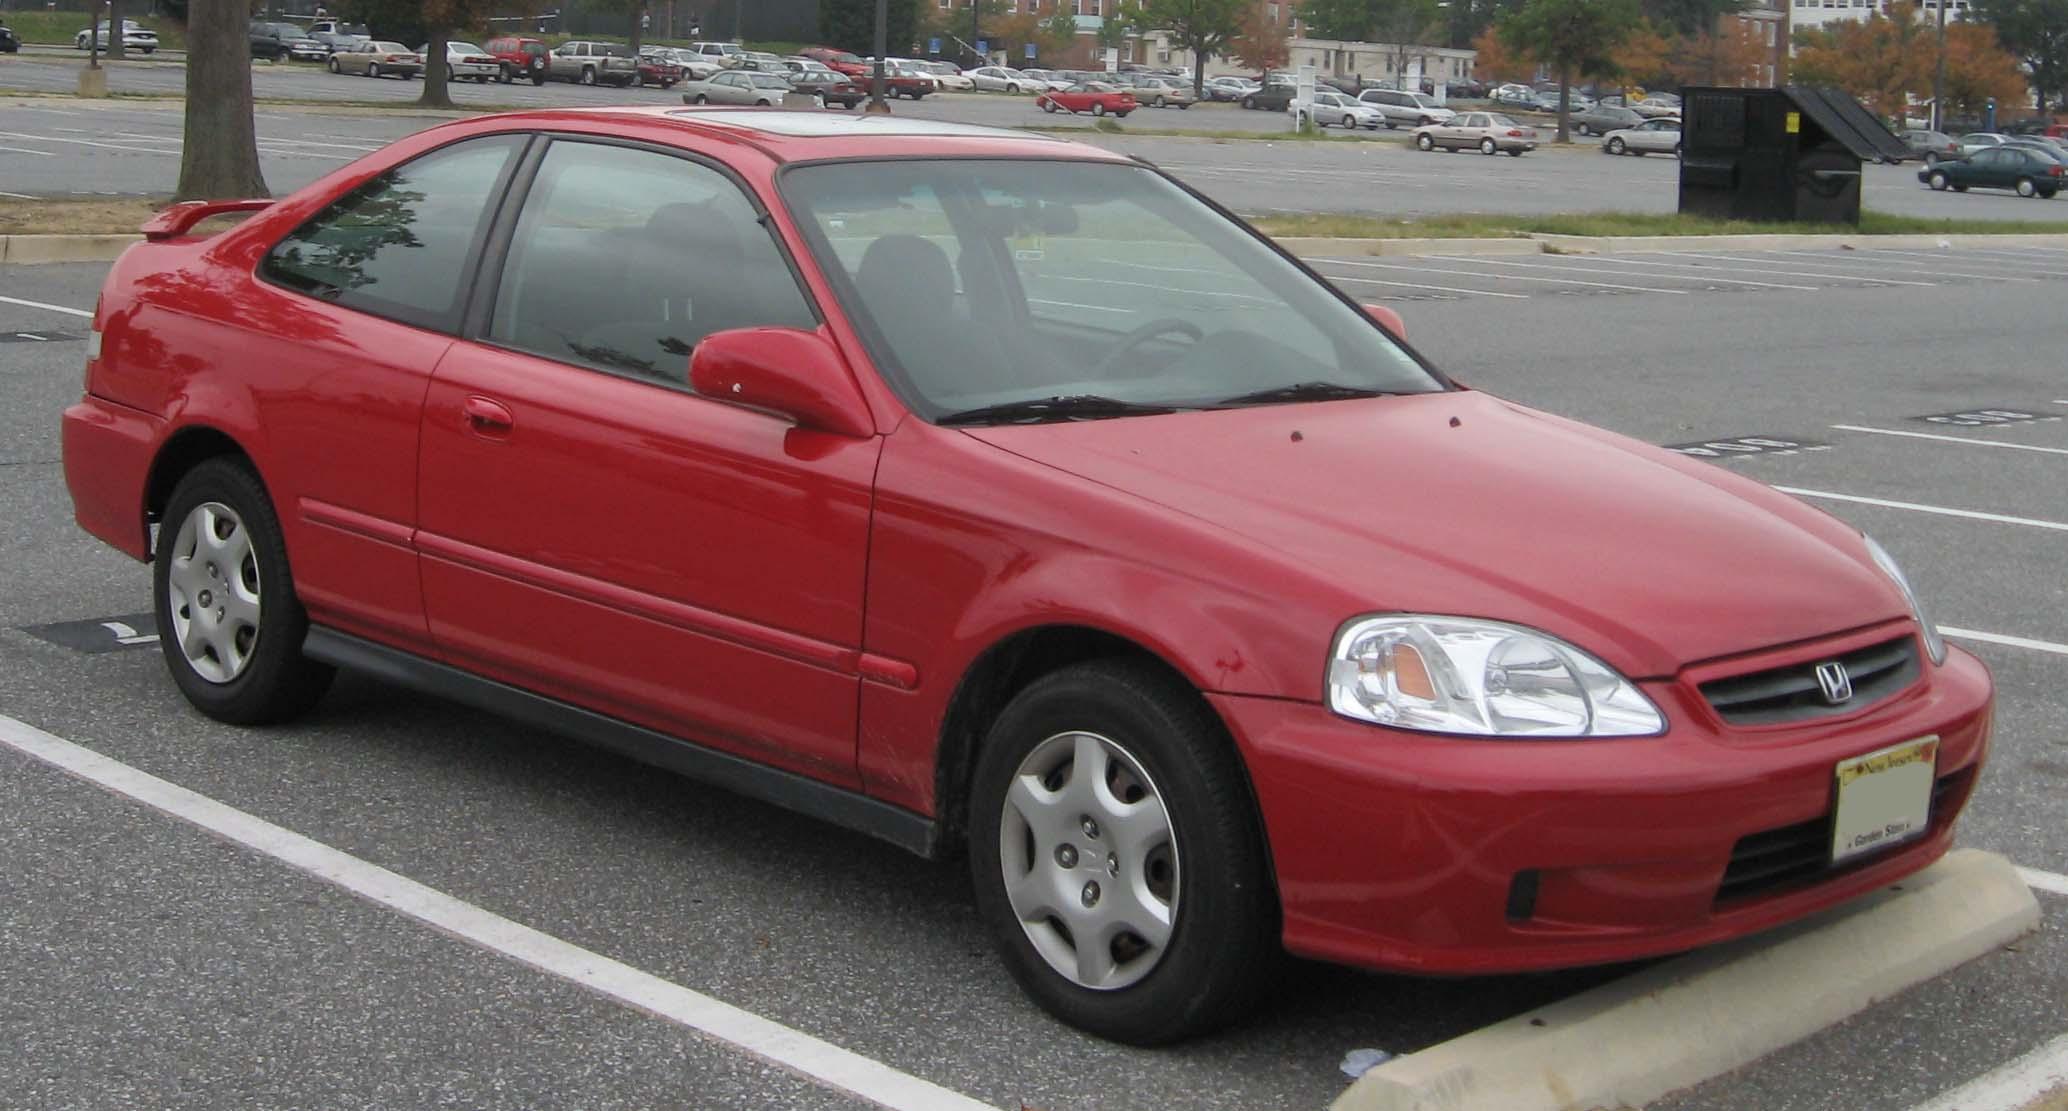 Honda Civic 2007 Coupe >> File:99-00 Honda Civic coupe.jpg - Wikimedia Commons